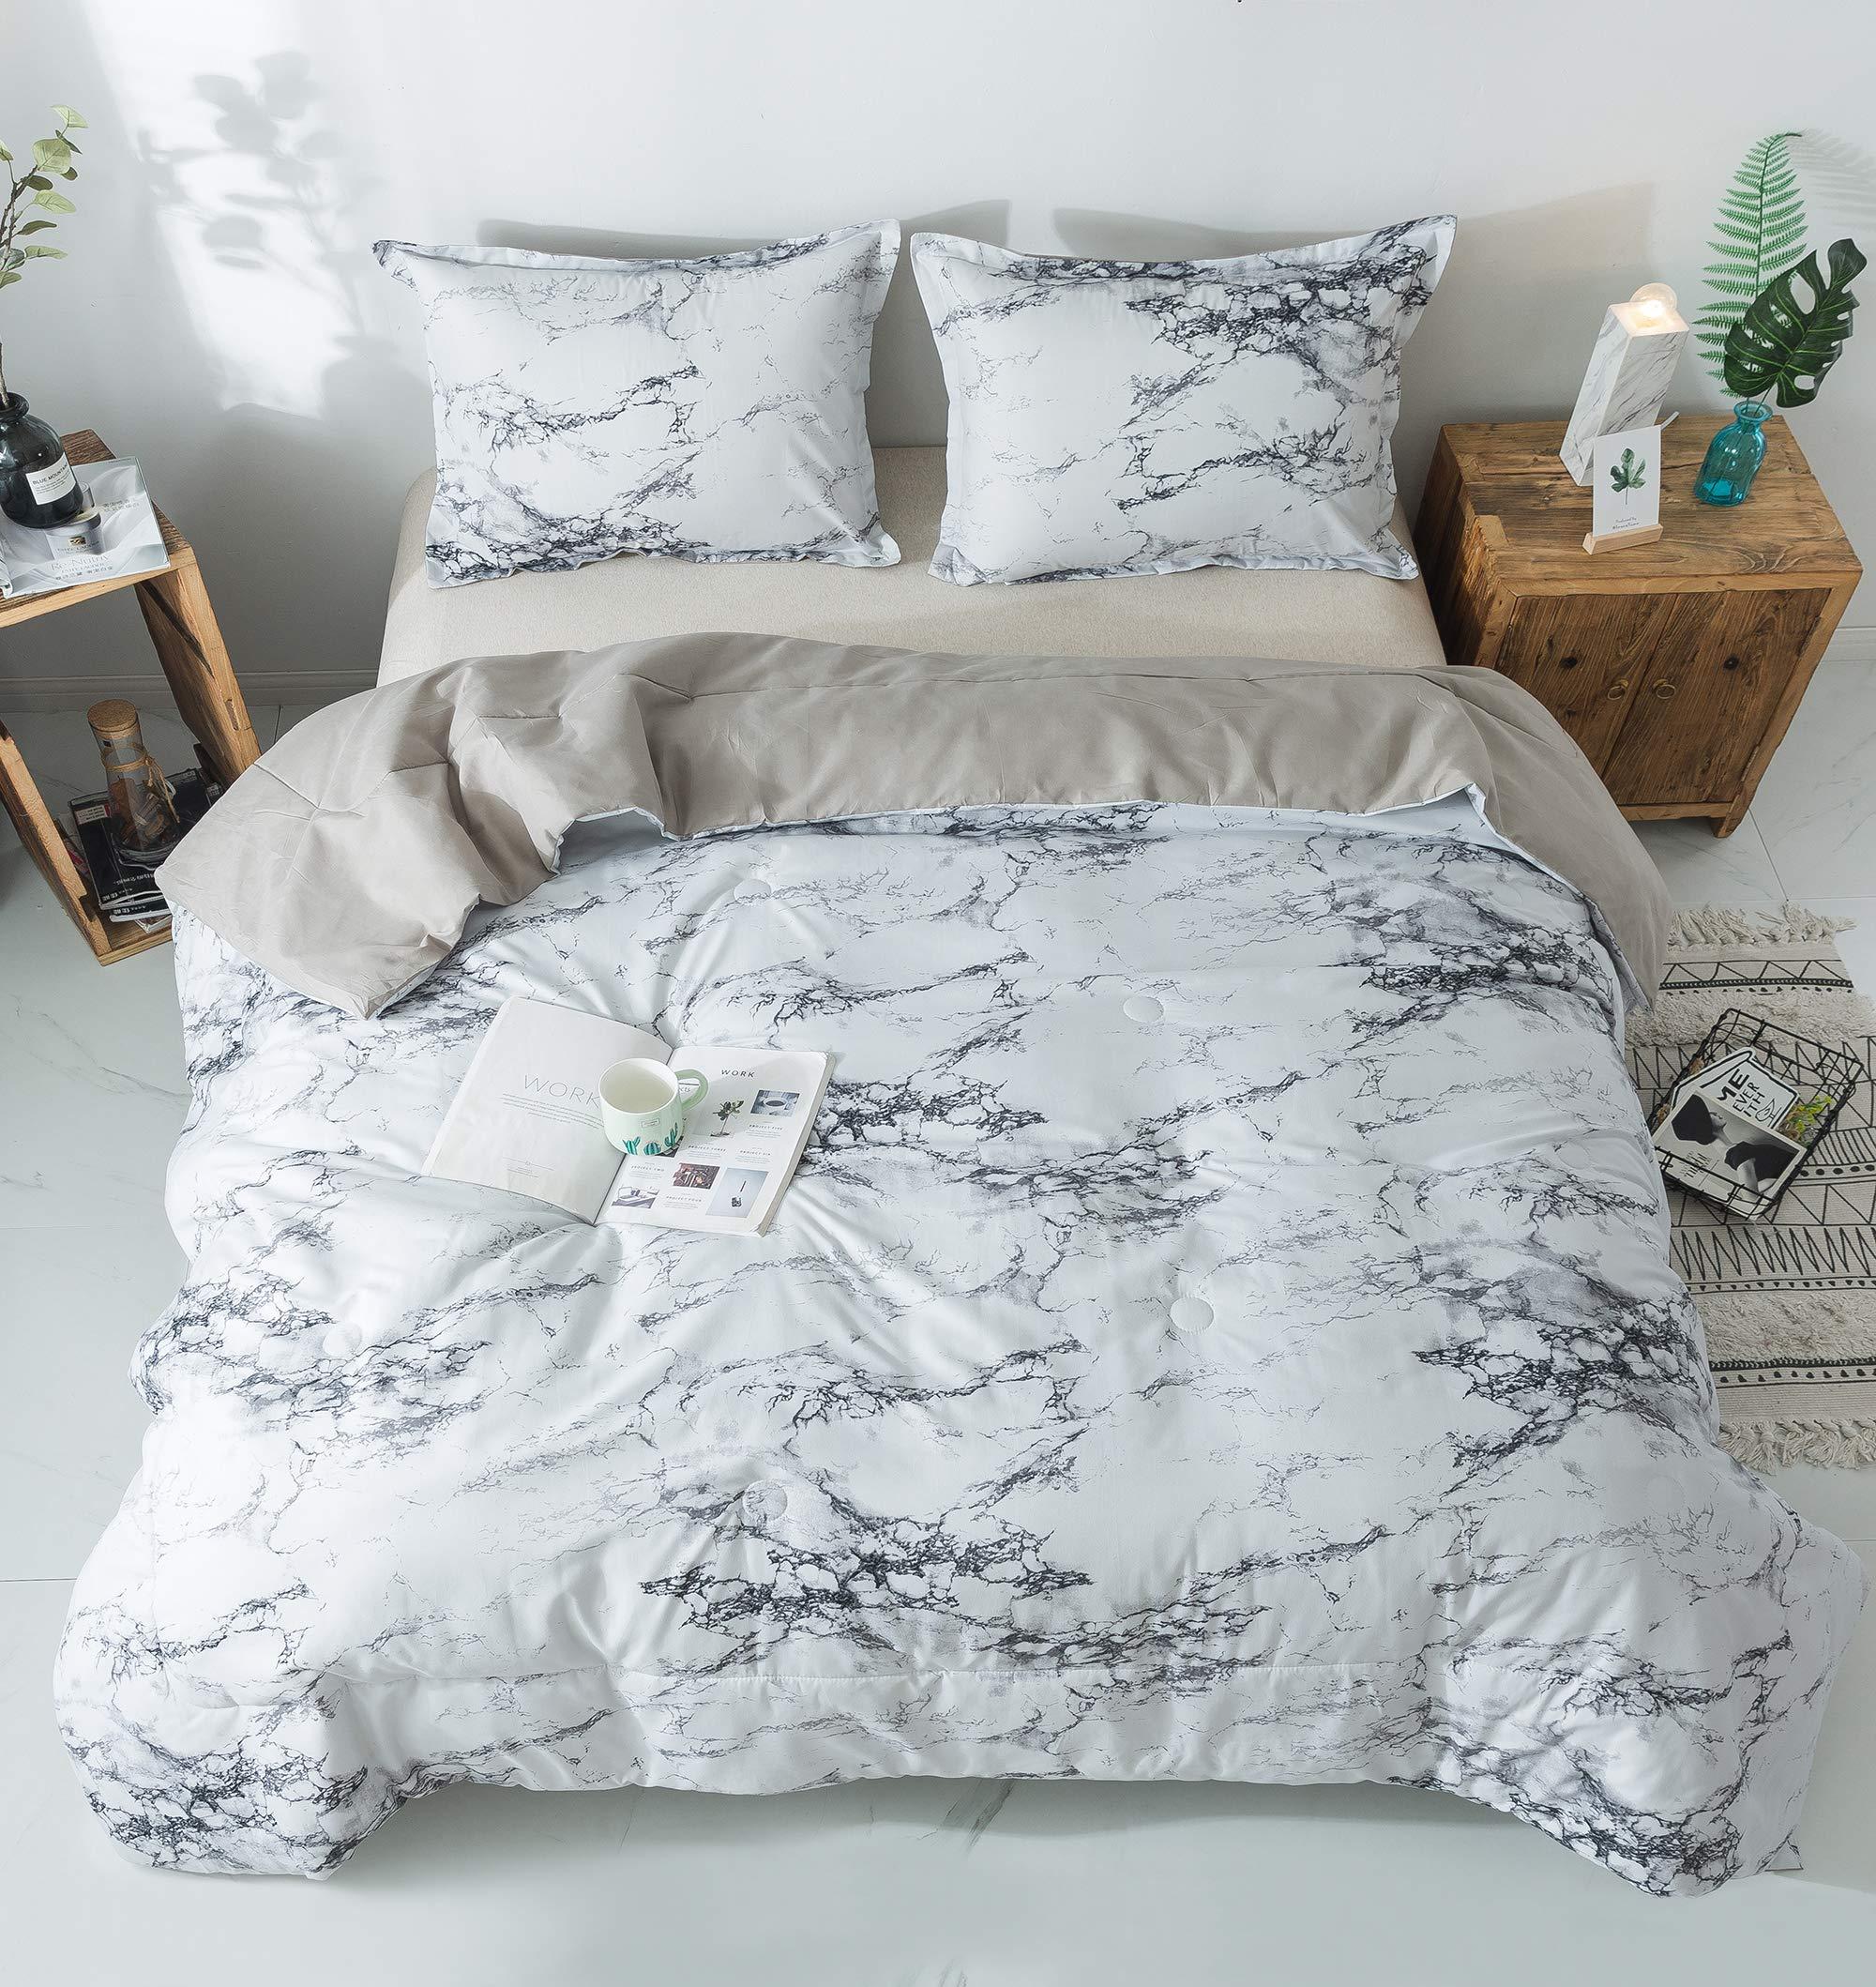 PomCo Marble Comforter Queen (90x90 Inch), 3Pcs(1 Marble Comforter & 2 Pillowcases) Grey Marble Print Microfiber Bedding Set, Modern Marble Pattern Comforter Set for Men, Women, Boy, Girl by PomCo